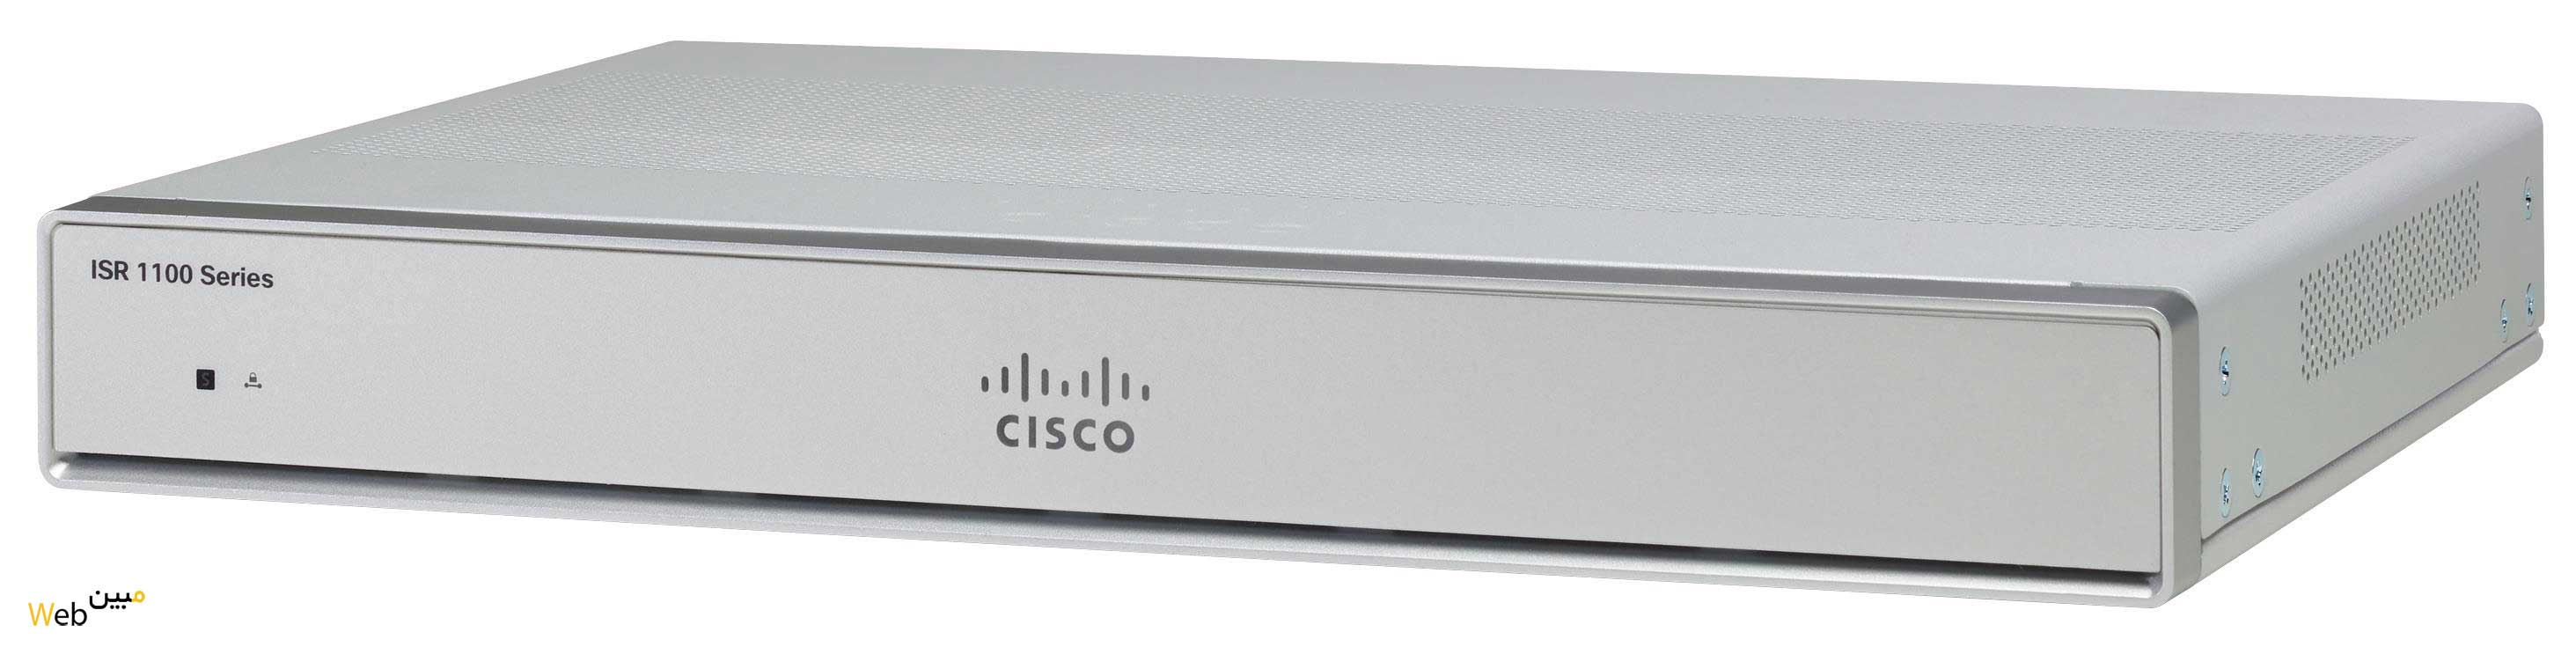 روتر شبکه سیسکو C1112-8P